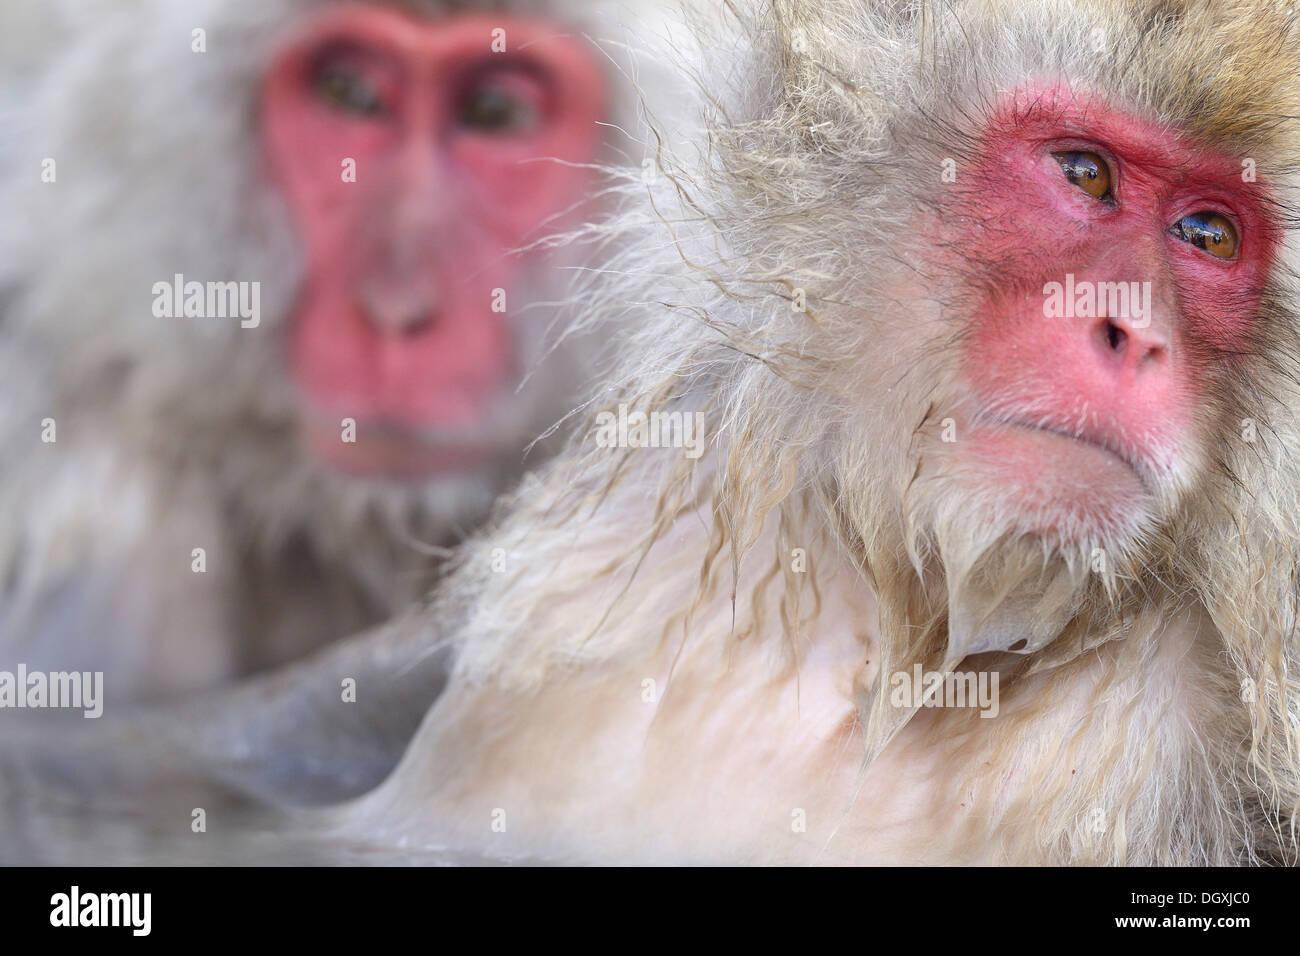 Japanese Macaques or Snow Monkeys (Macaca fuscata), portrait, Affenpark Jigokudani, Nagano Präfektur, Japan - Stock Image